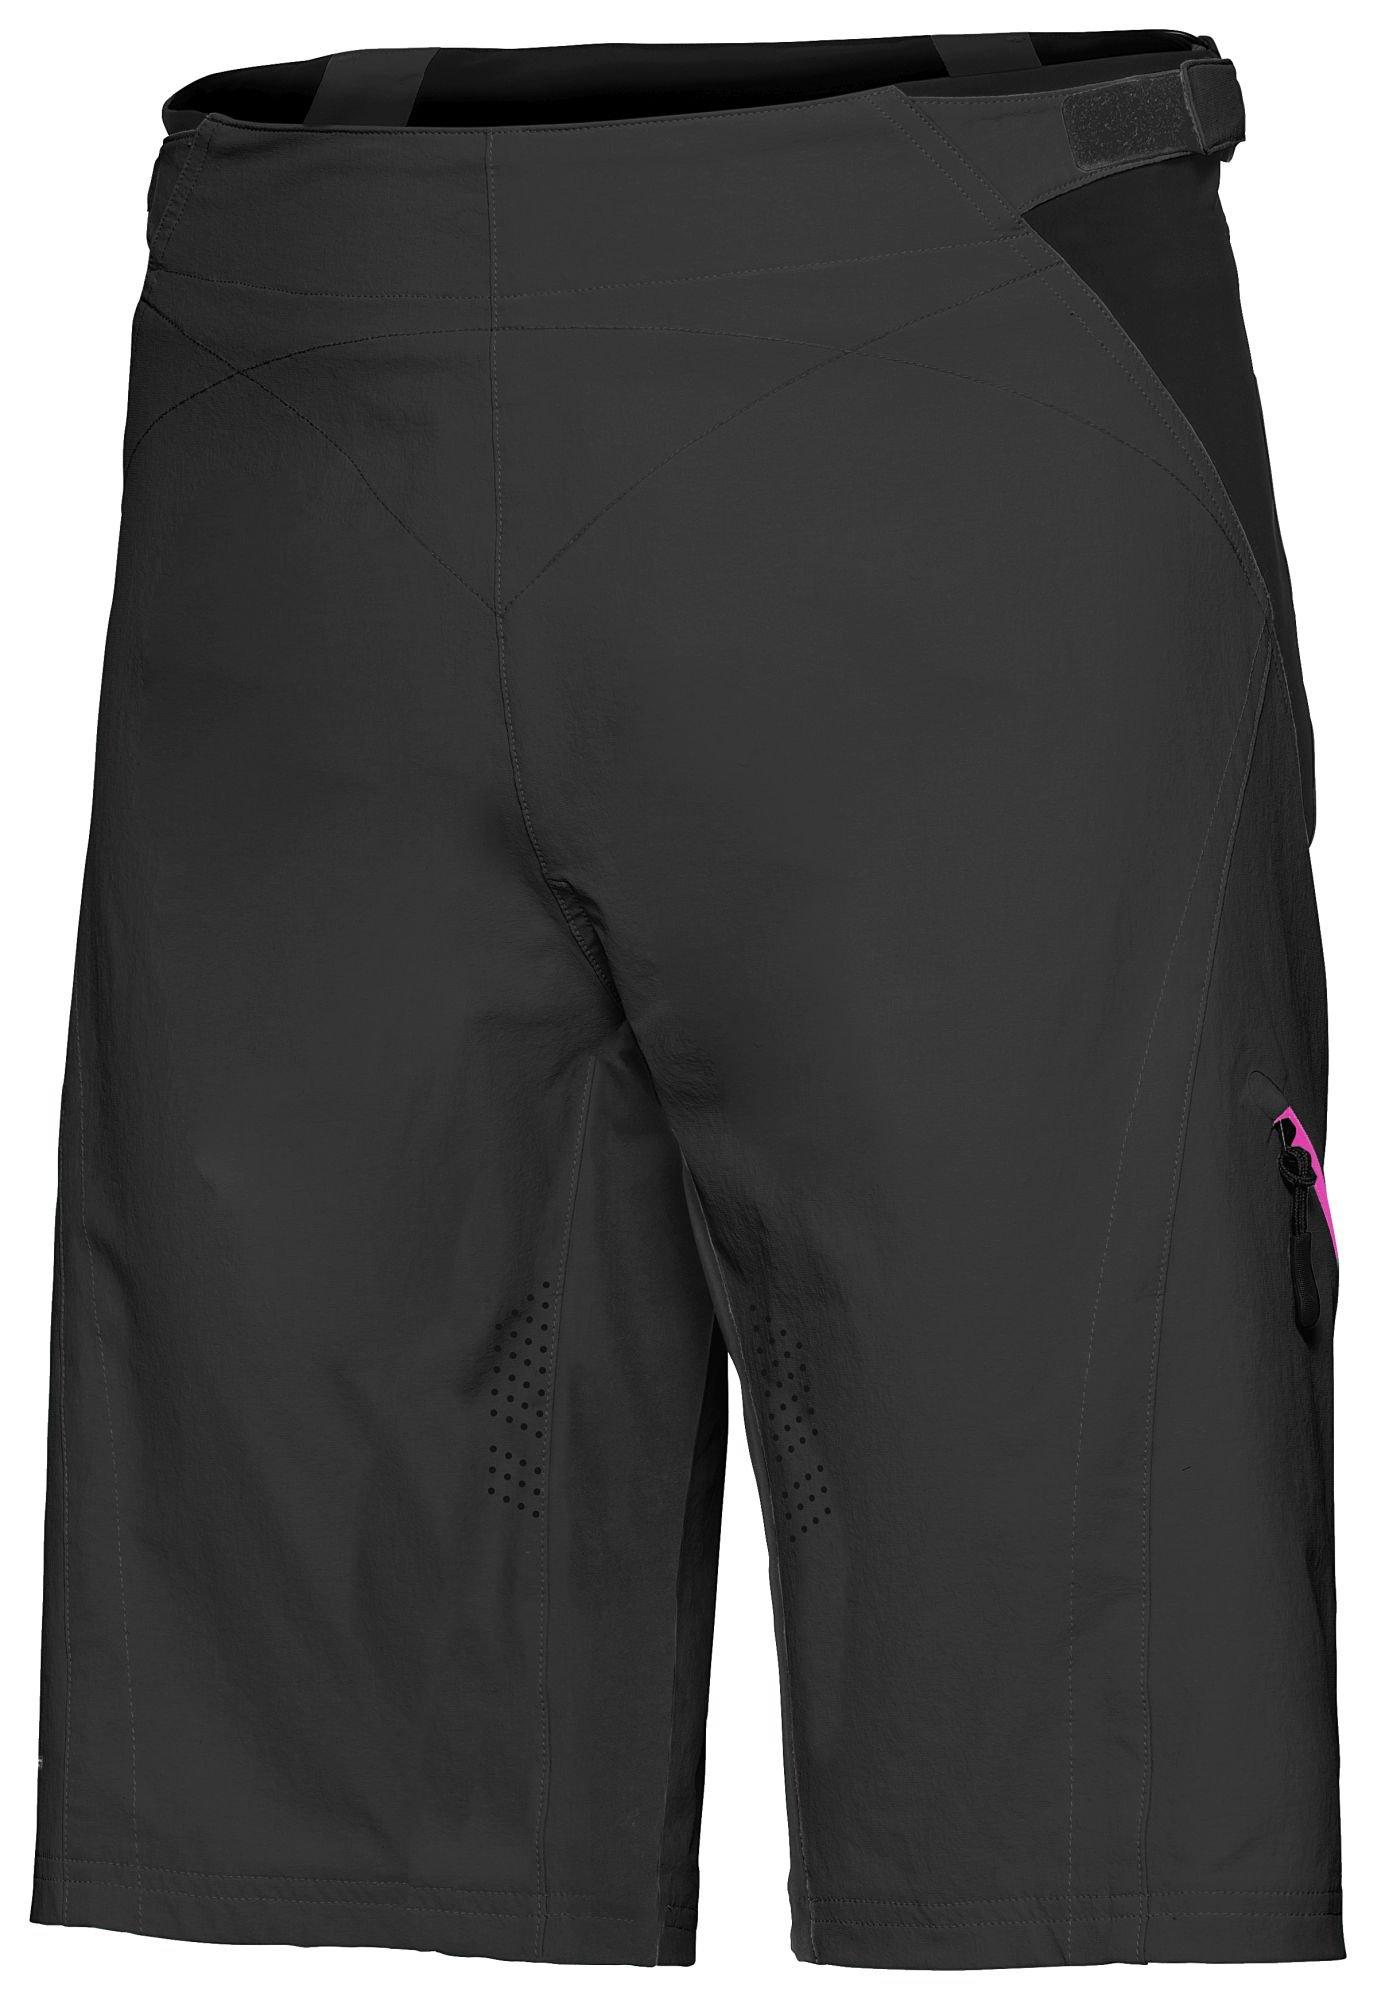 BULLS Shorts Kiba XXL black